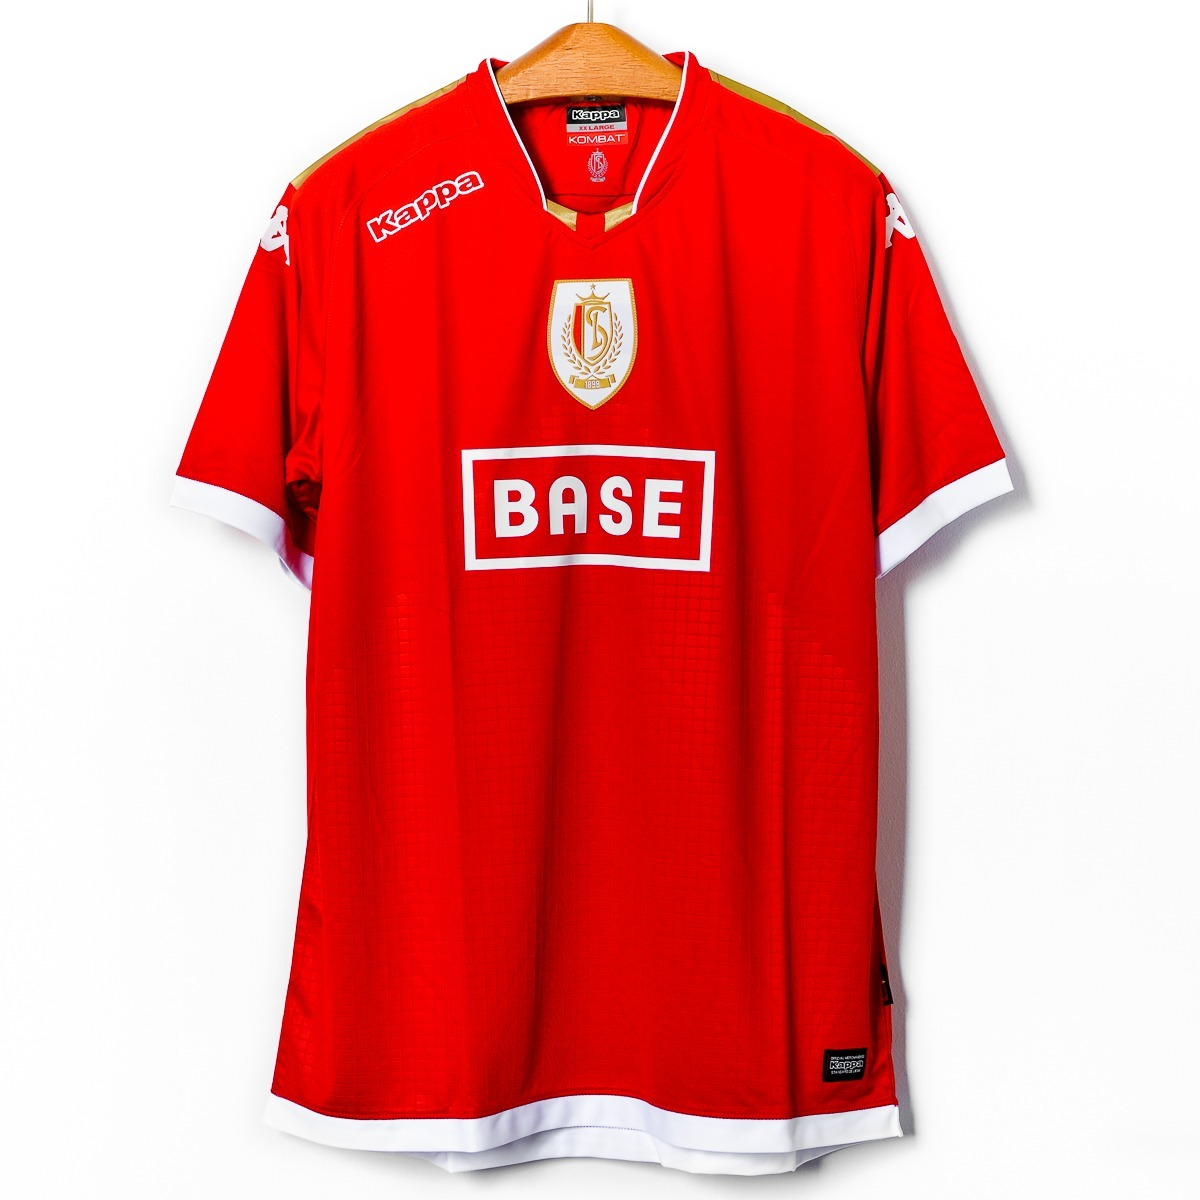 8d4c25ce5 camisas masculinas futebol standard liege 2016 17 kappa gara. Carregando  zoom.